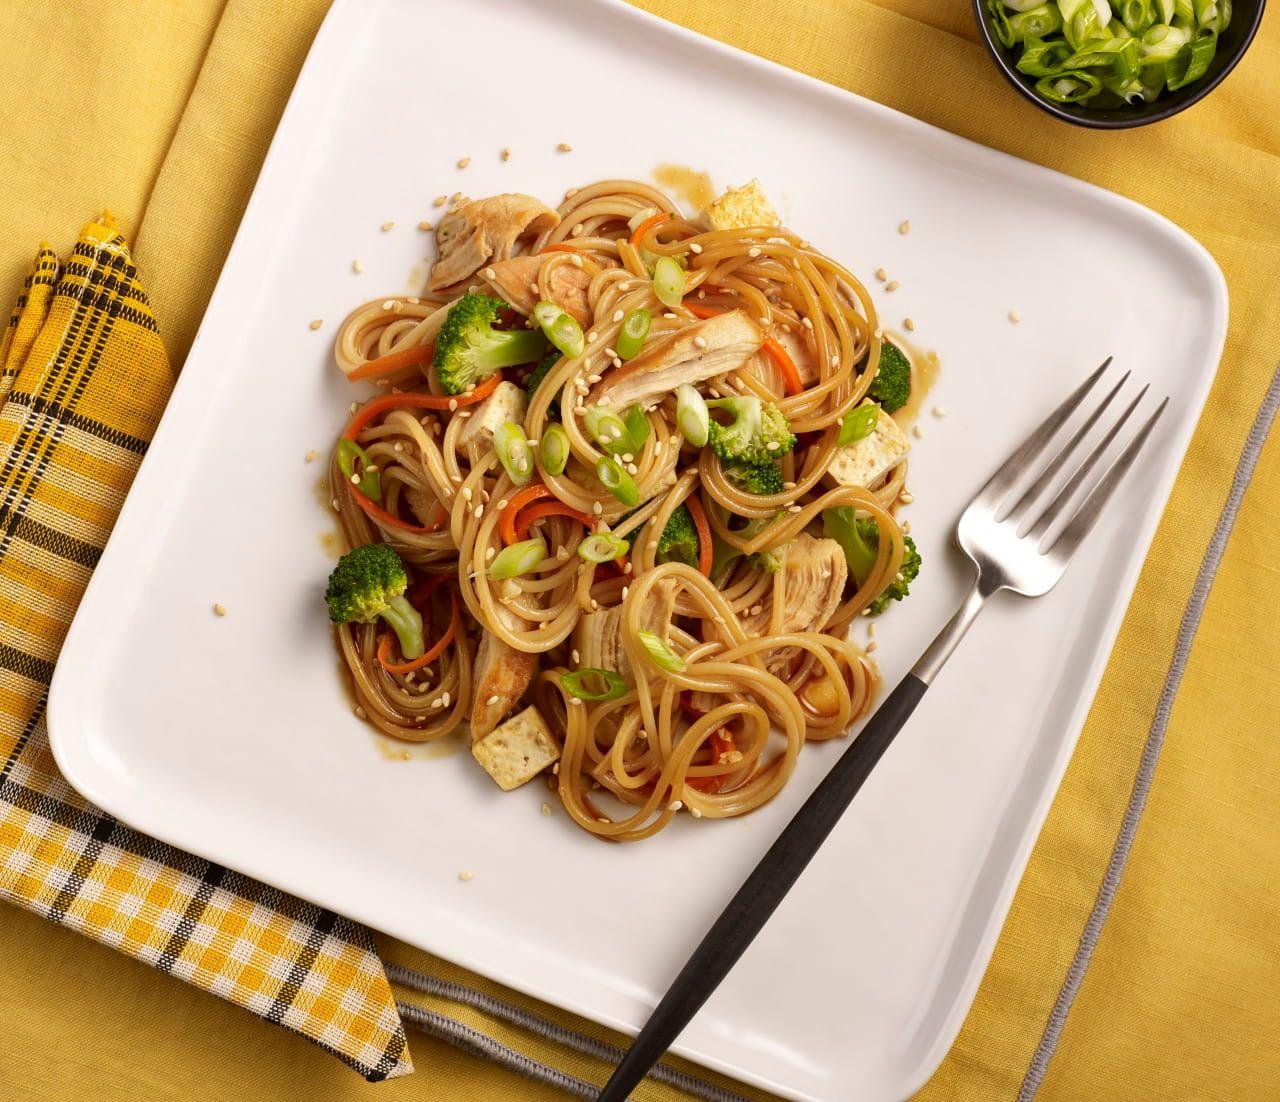 Spaghetti and Veggie Stir Fry